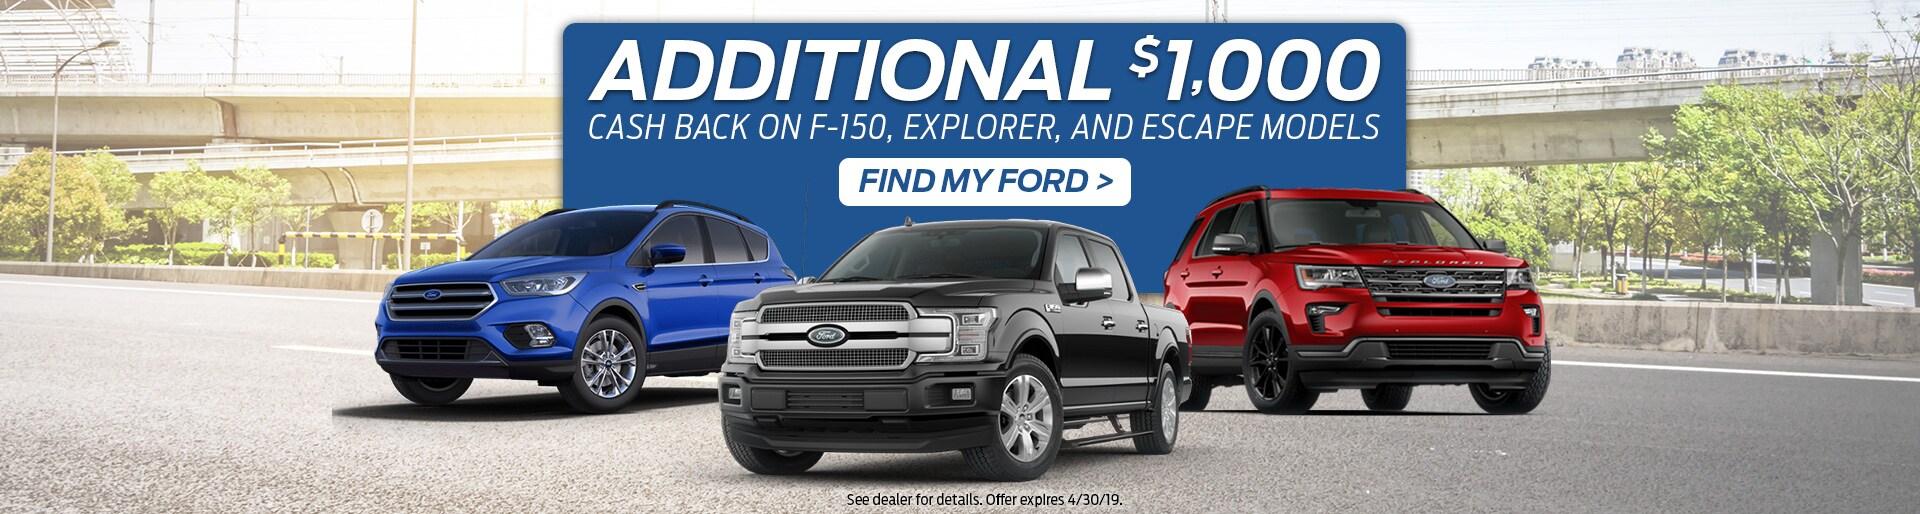 ea1da0a682 Ford Dealer Sacramento CA